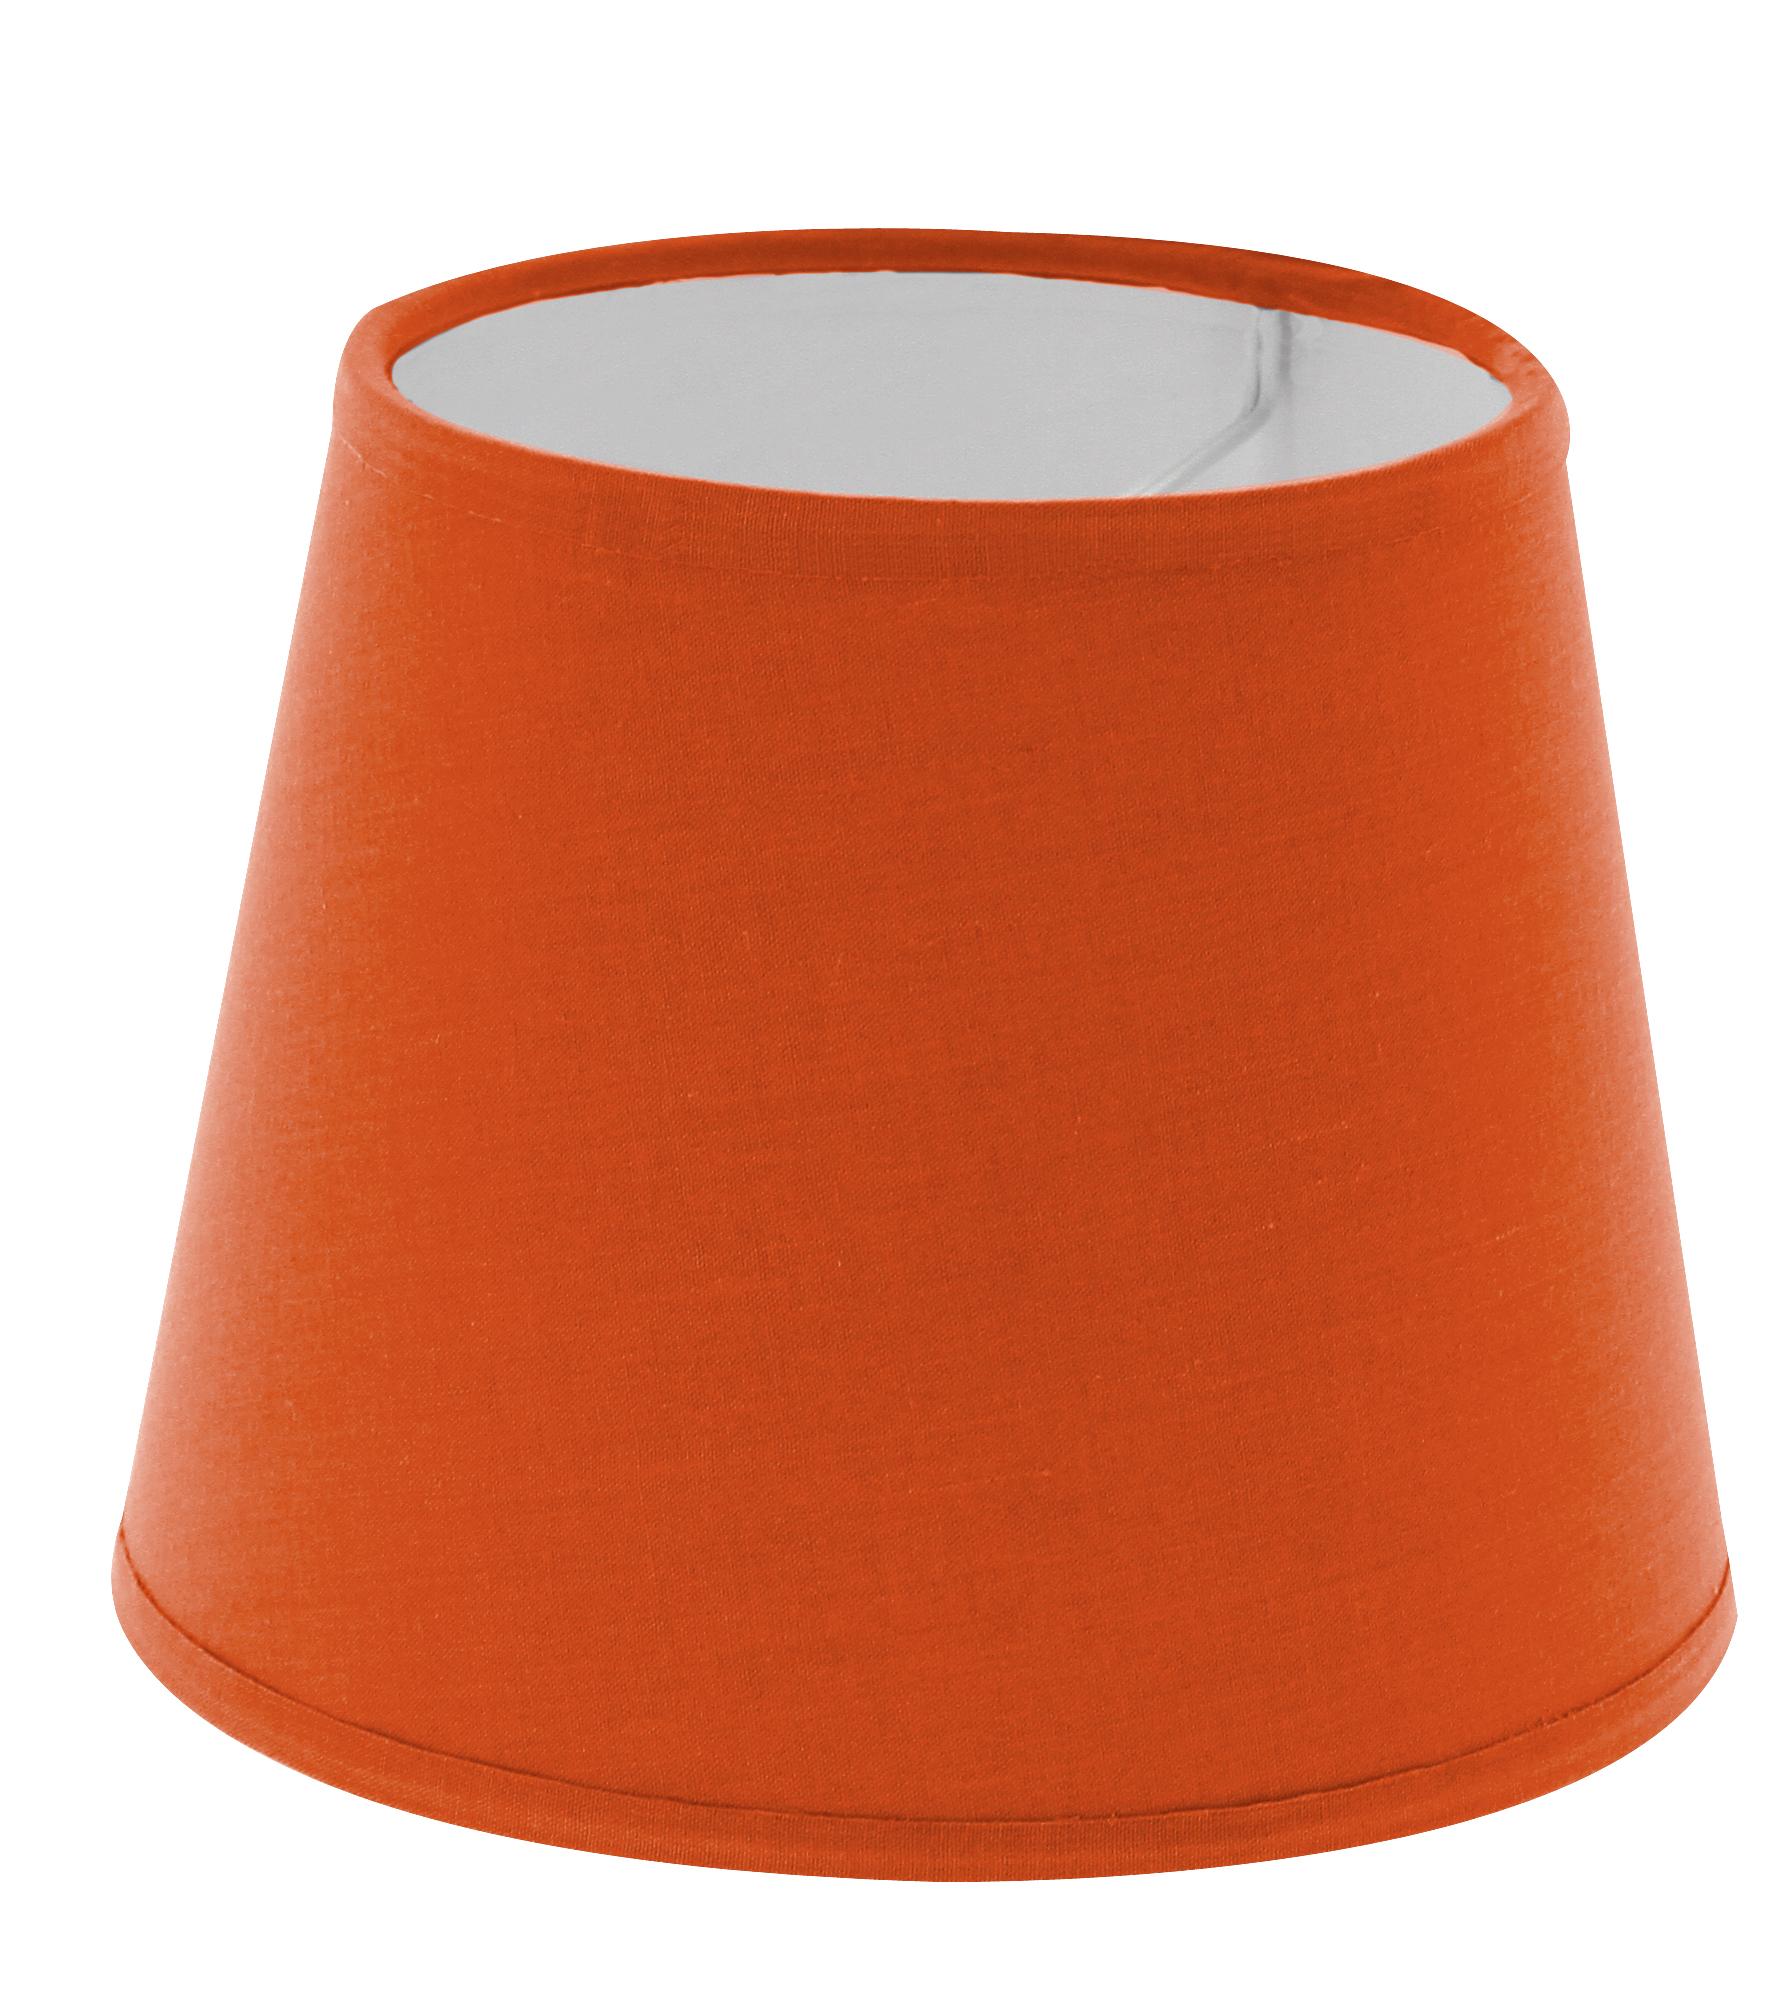 abat jour pince orange mango forme am ricaine abat jour. Black Bedroom Furniture Sets. Home Design Ideas